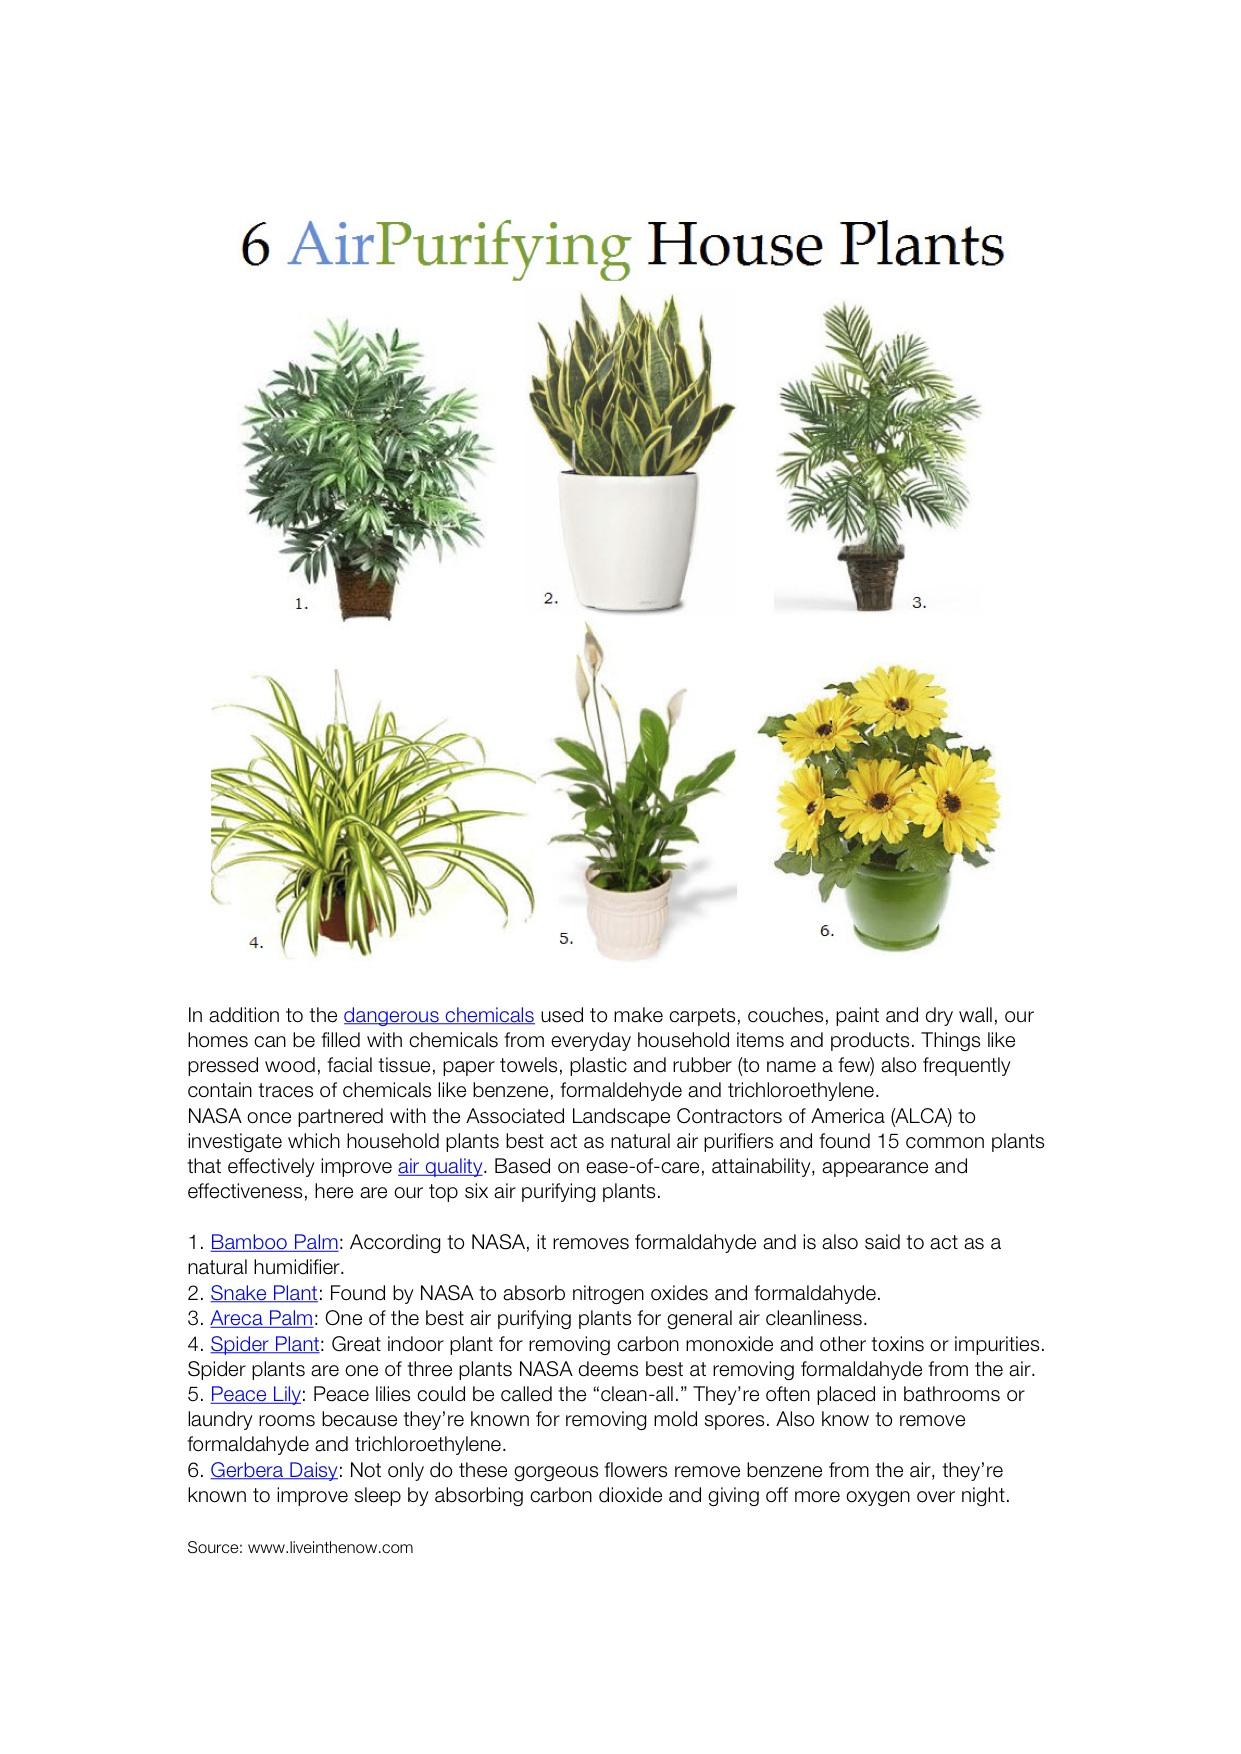 nasa air quality plants - photo #8